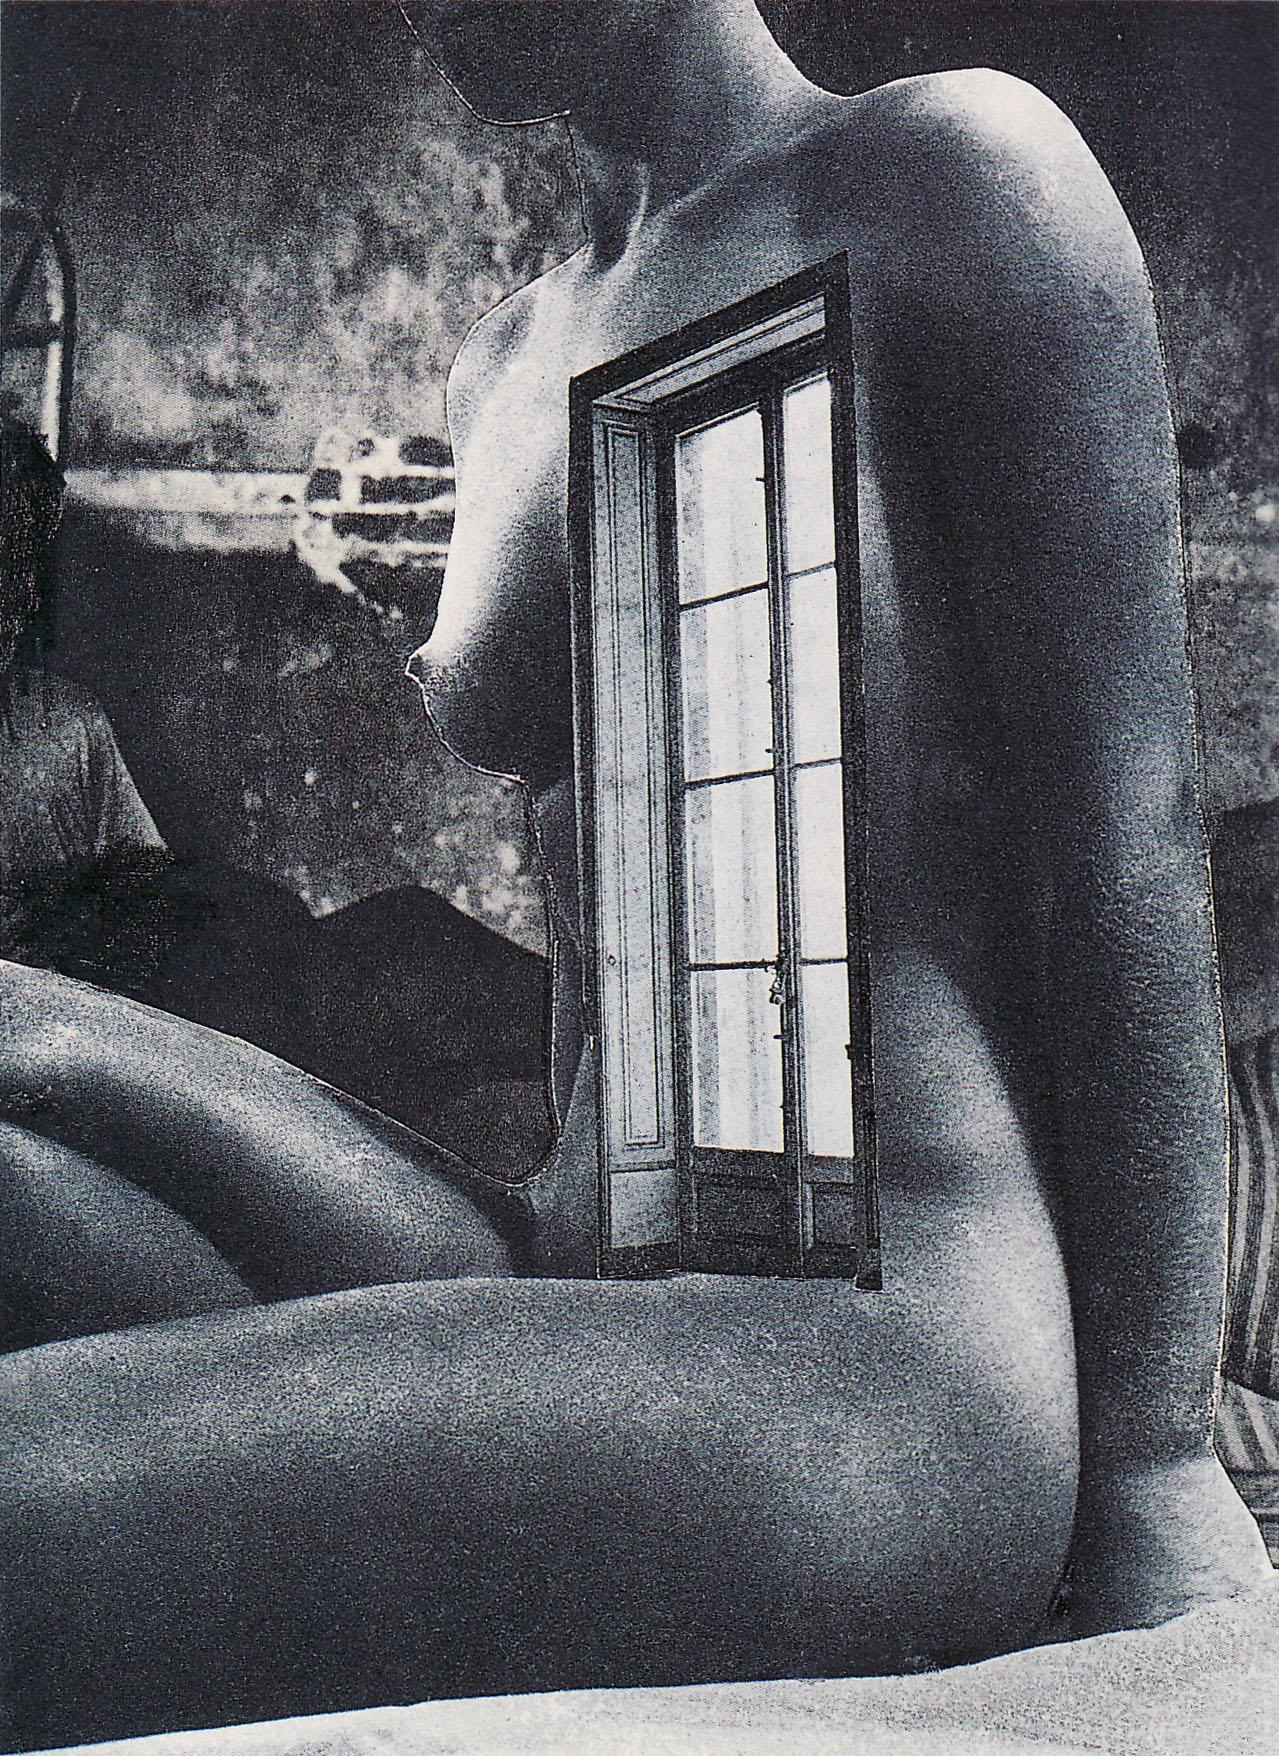 Karel Teige, collage 323, 1946. Source: Karel Teige.